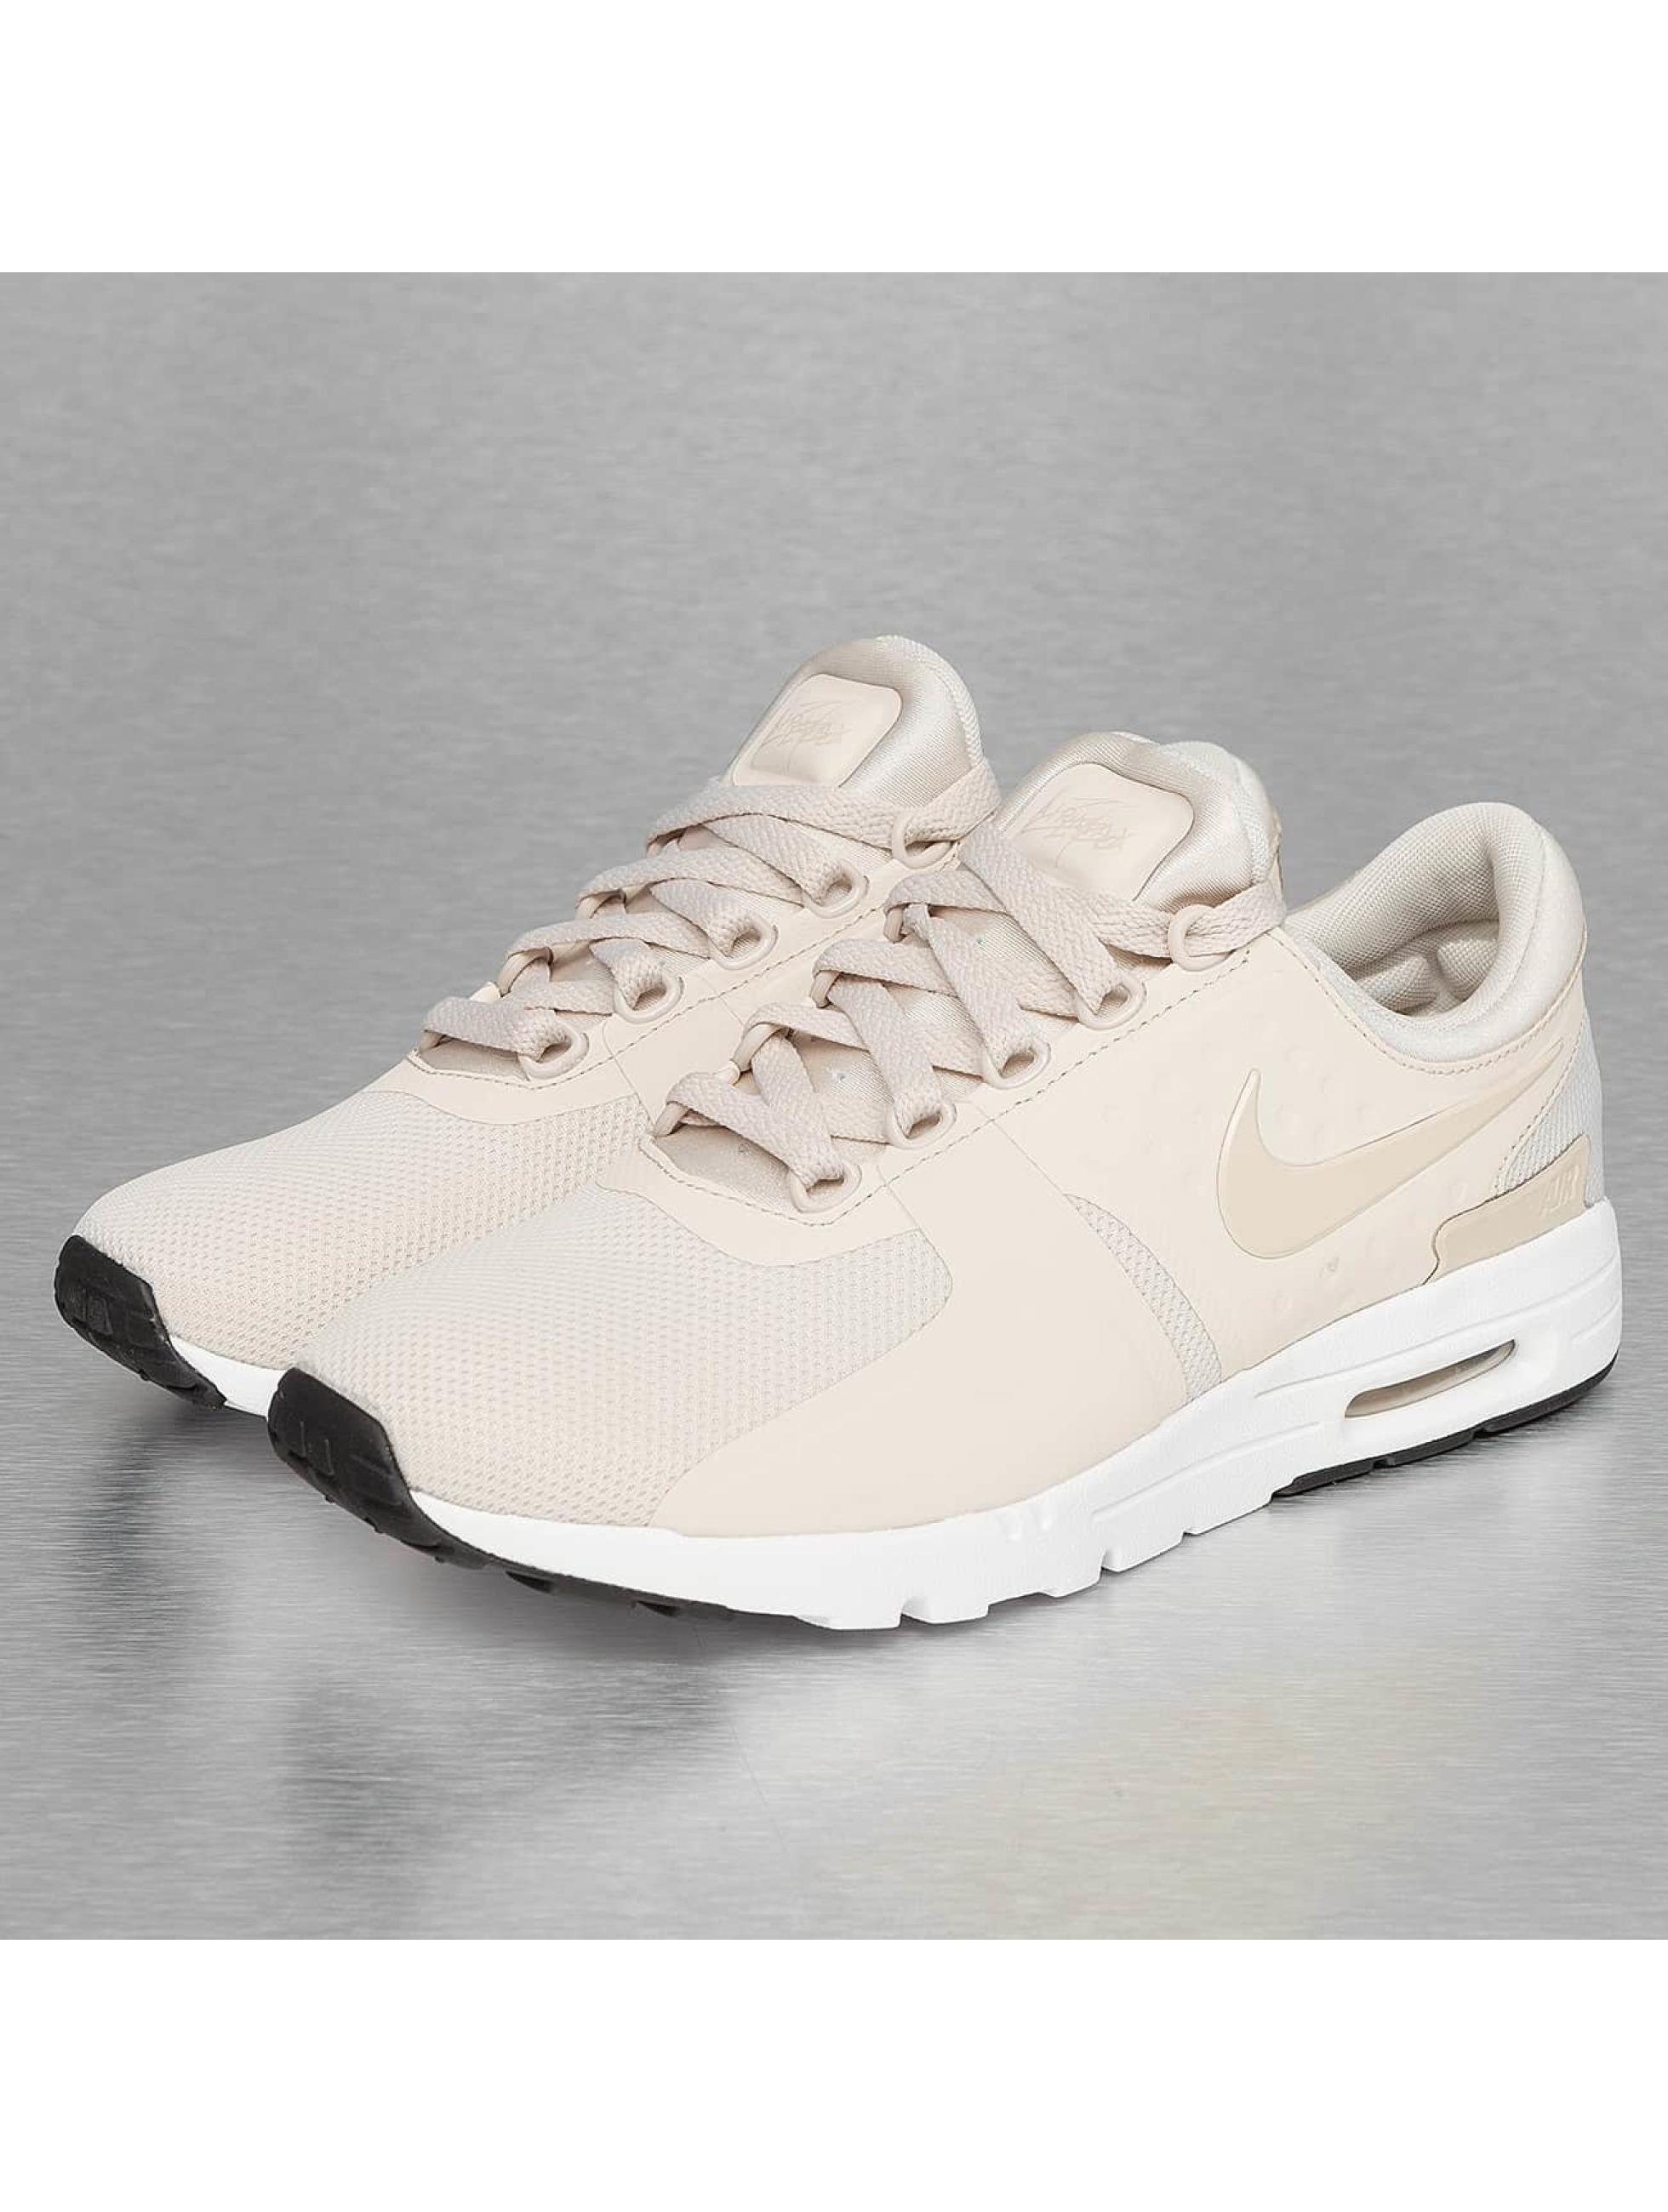 nike schoen sneaker air max zero in beige 295272. Black Bedroom Furniture Sets. Home Design Ideas